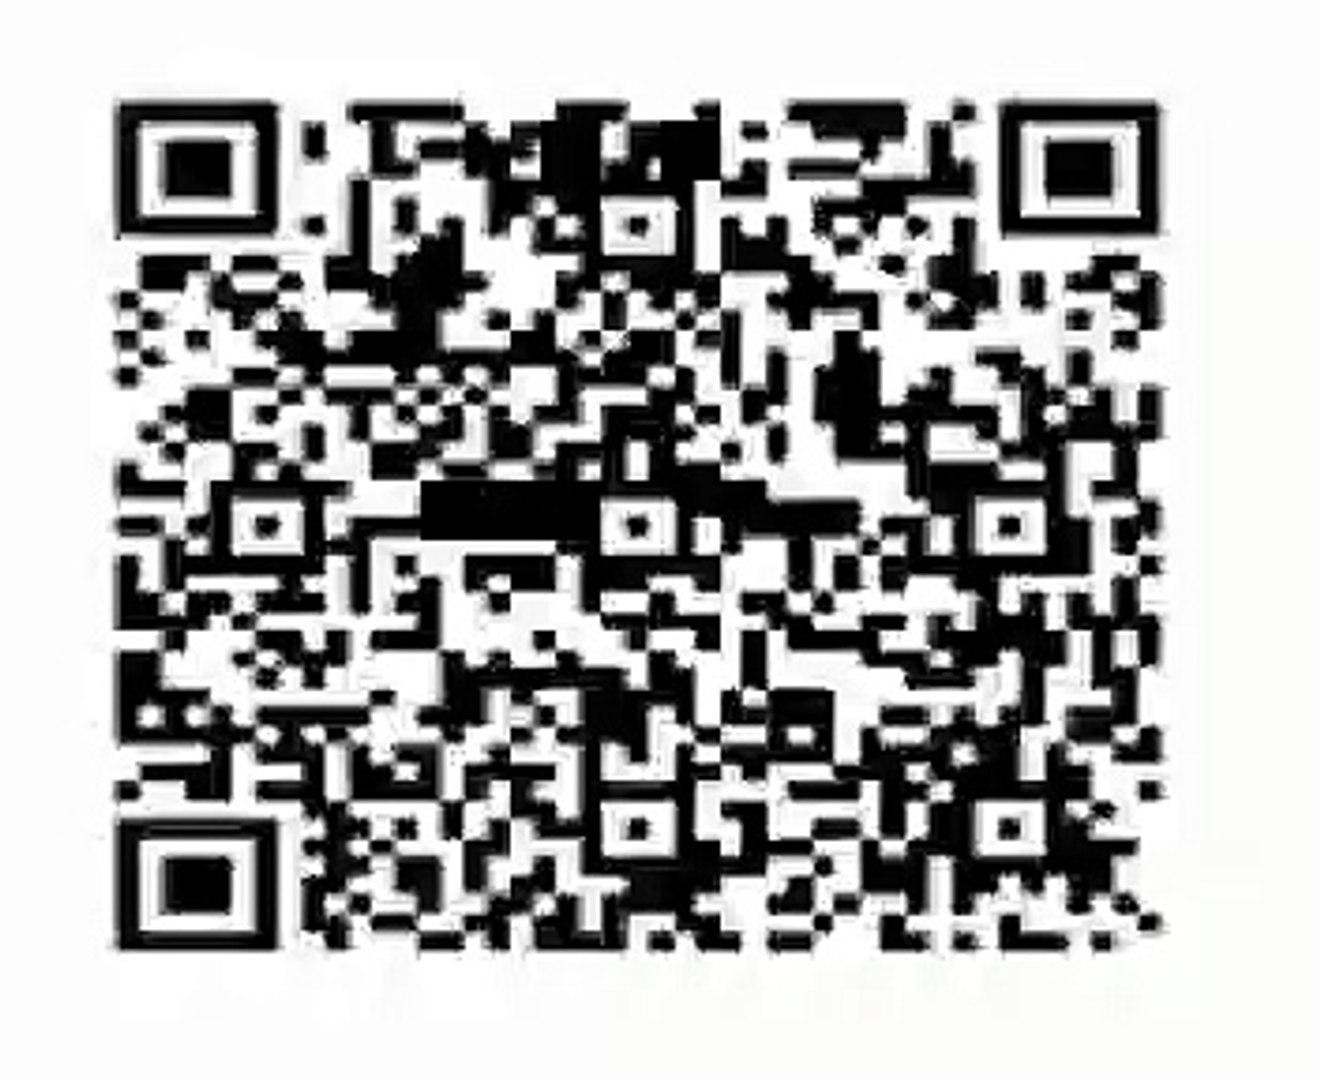 P E T S H O P B O Y S - Integral  (JCRZ - QR Code Video Remix)